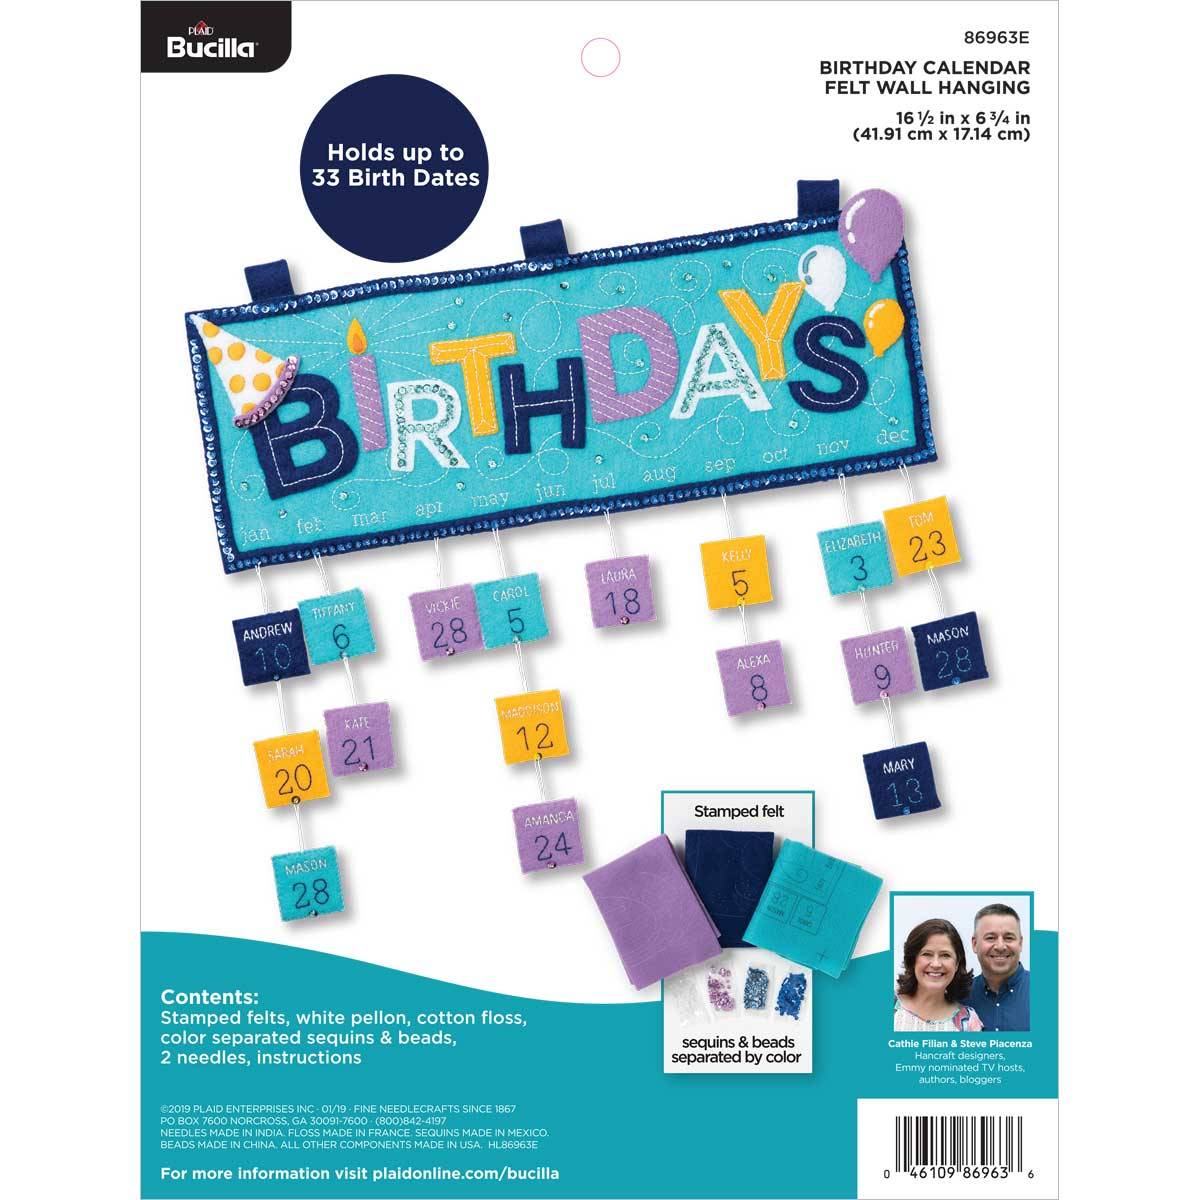 Bucilla ® Felt - Home Decor - Everyday Birthday Calendar Wall Hanging